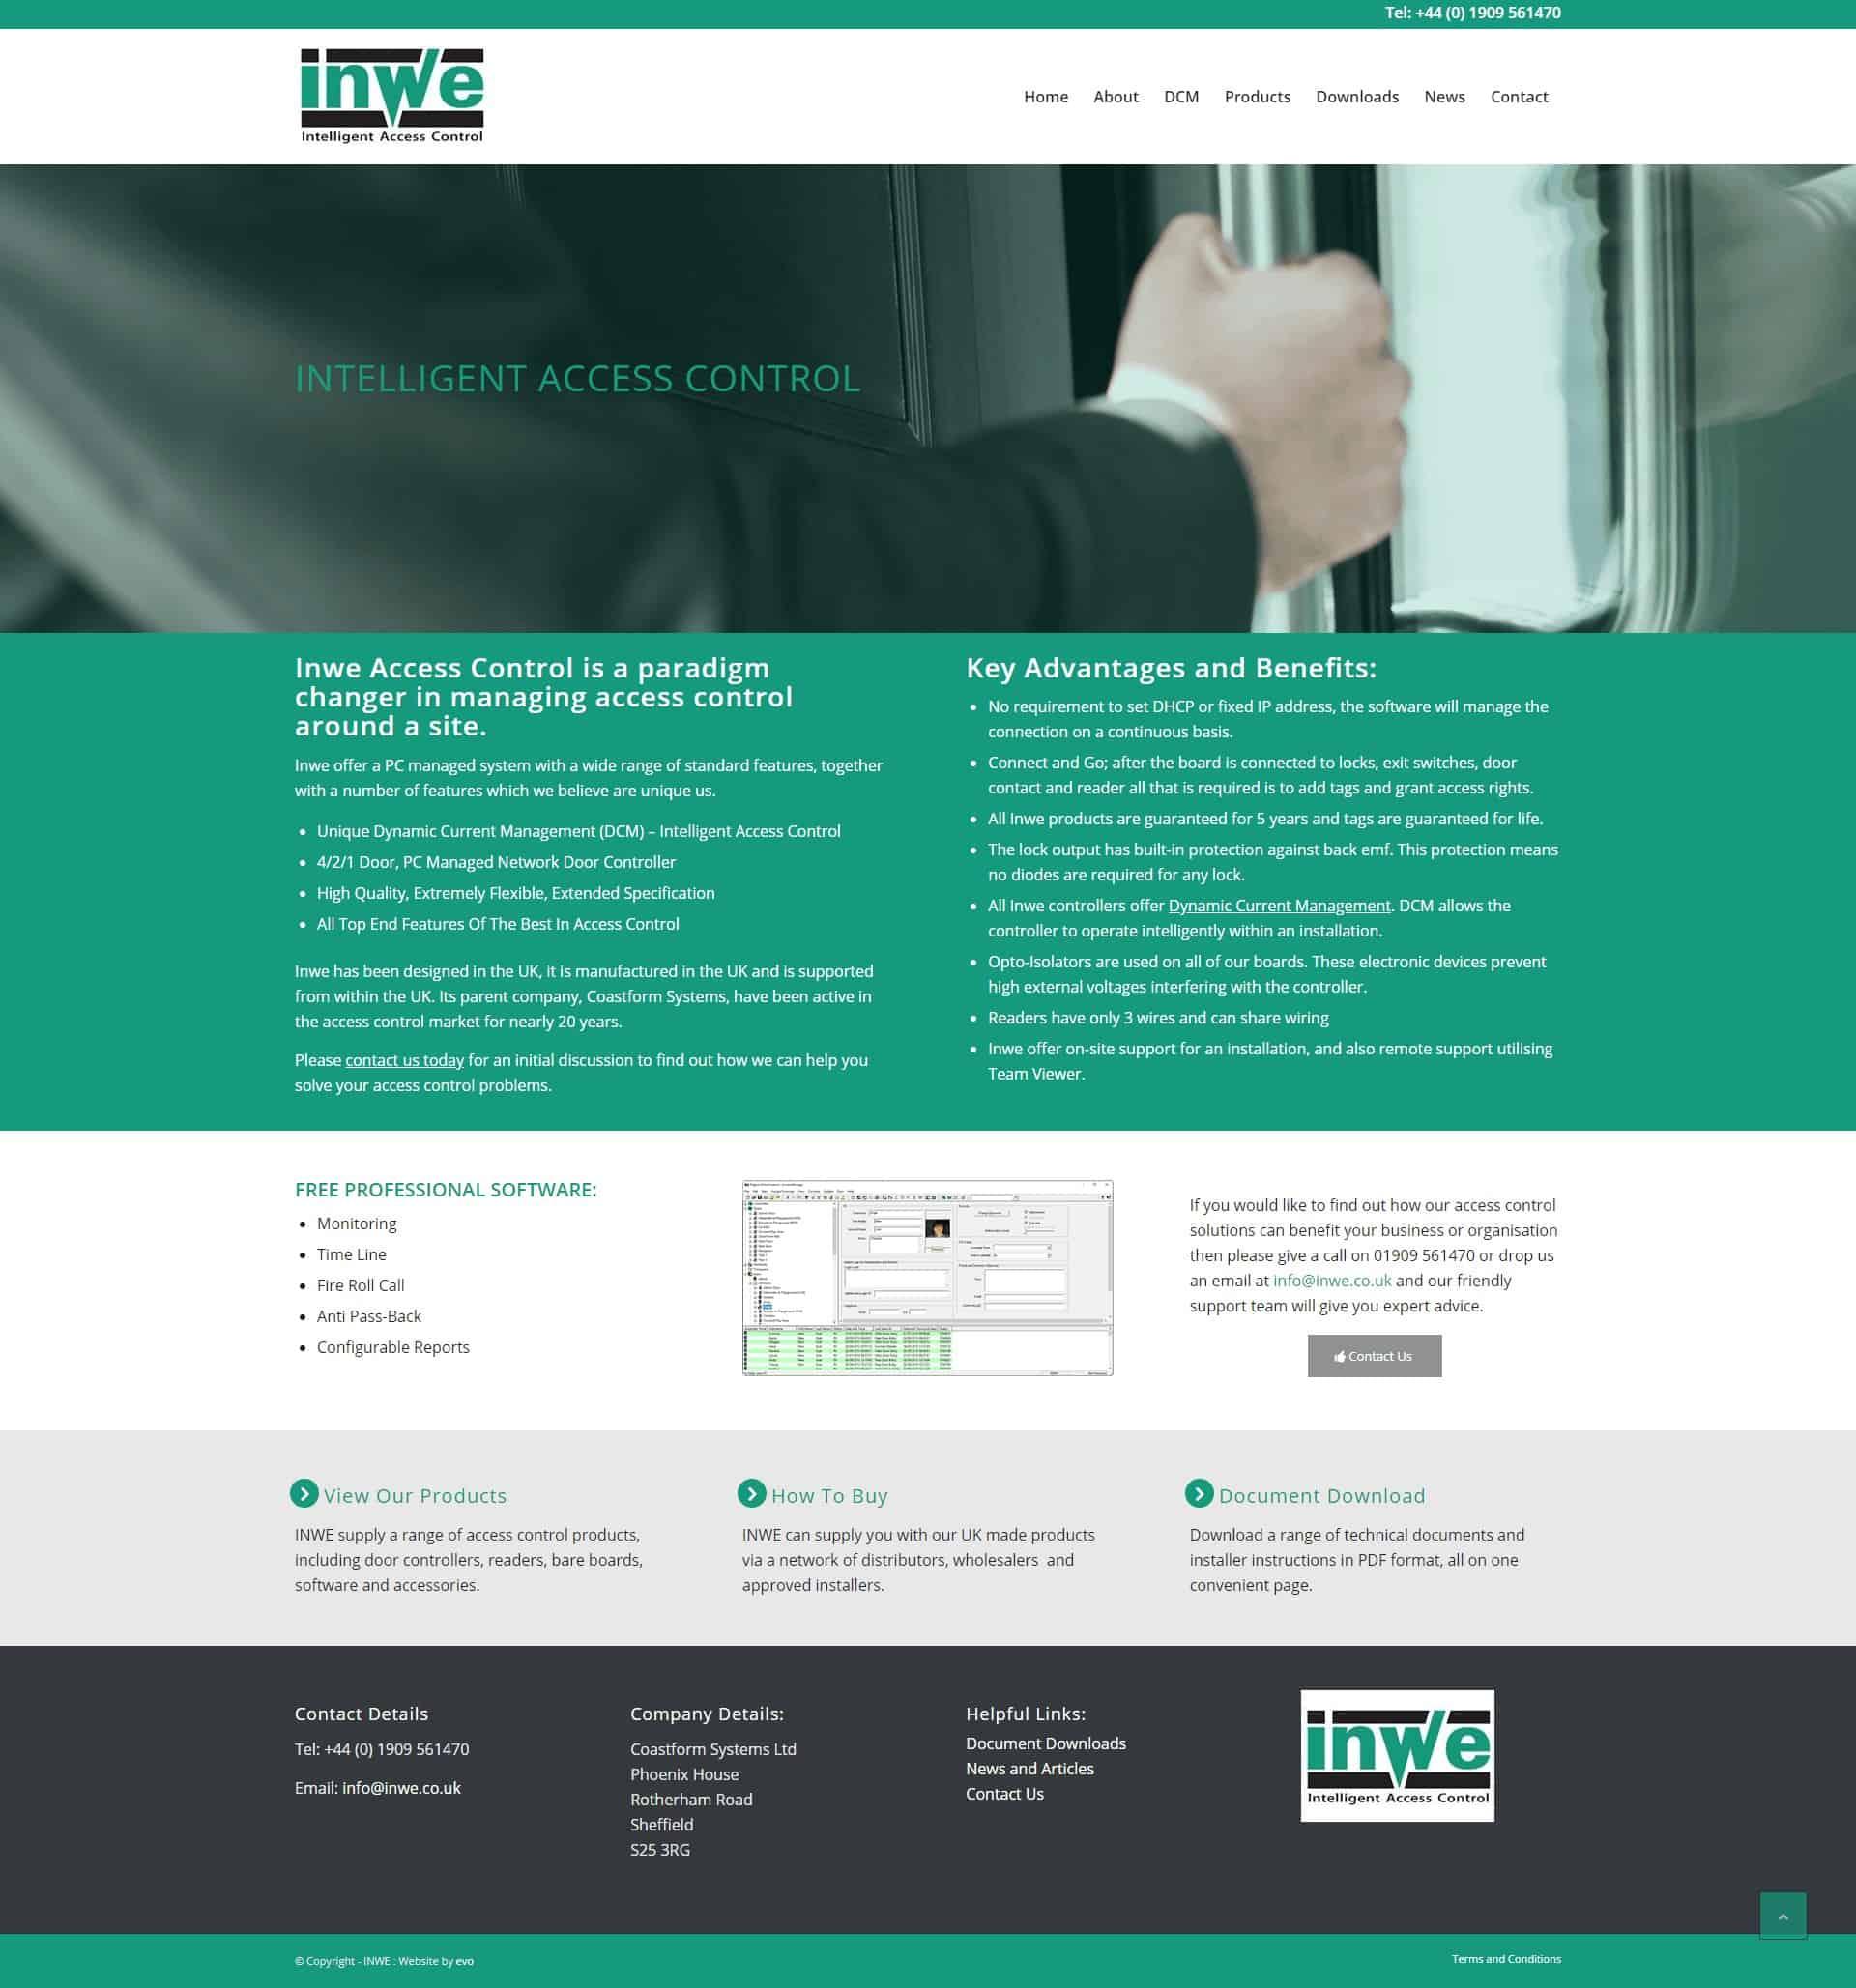 INWE Access Control Website